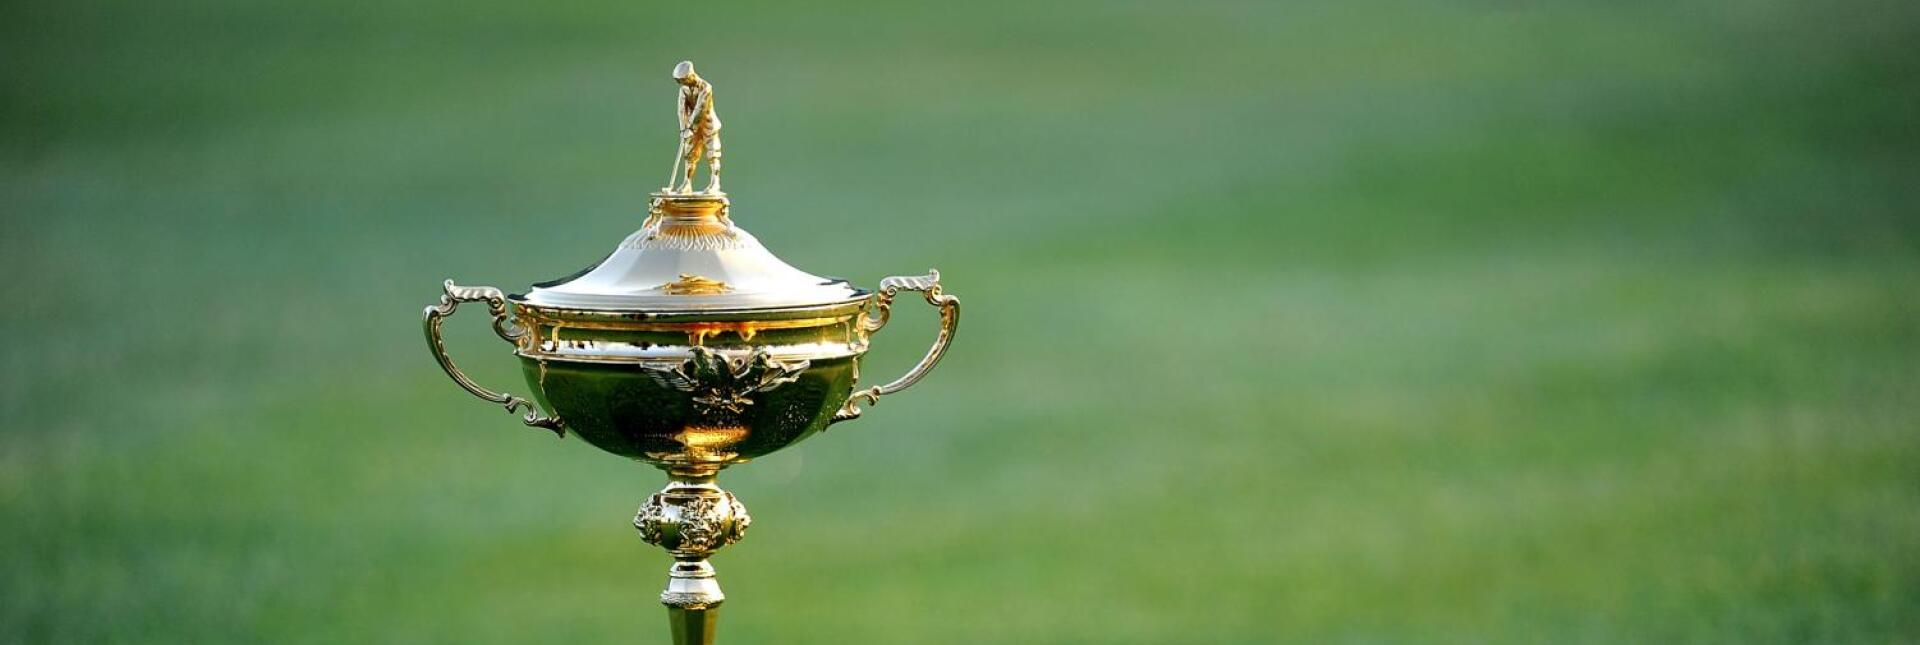 Ryder Cup trophy.jpg